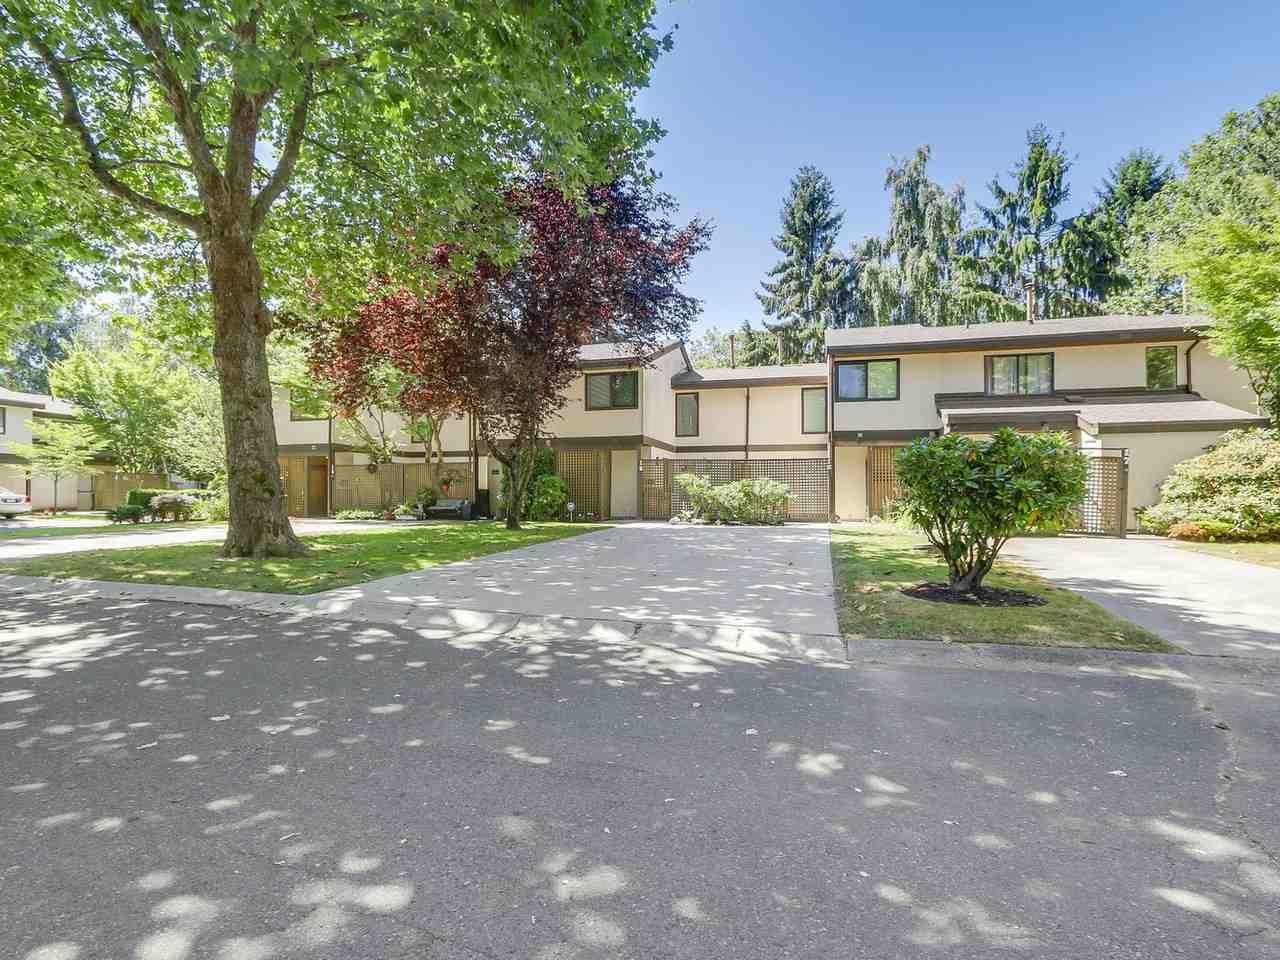 Main Photo: 15 11491 7TH AVENUE in : Steveston Village Townhouse for sale : MLS®# R2192032